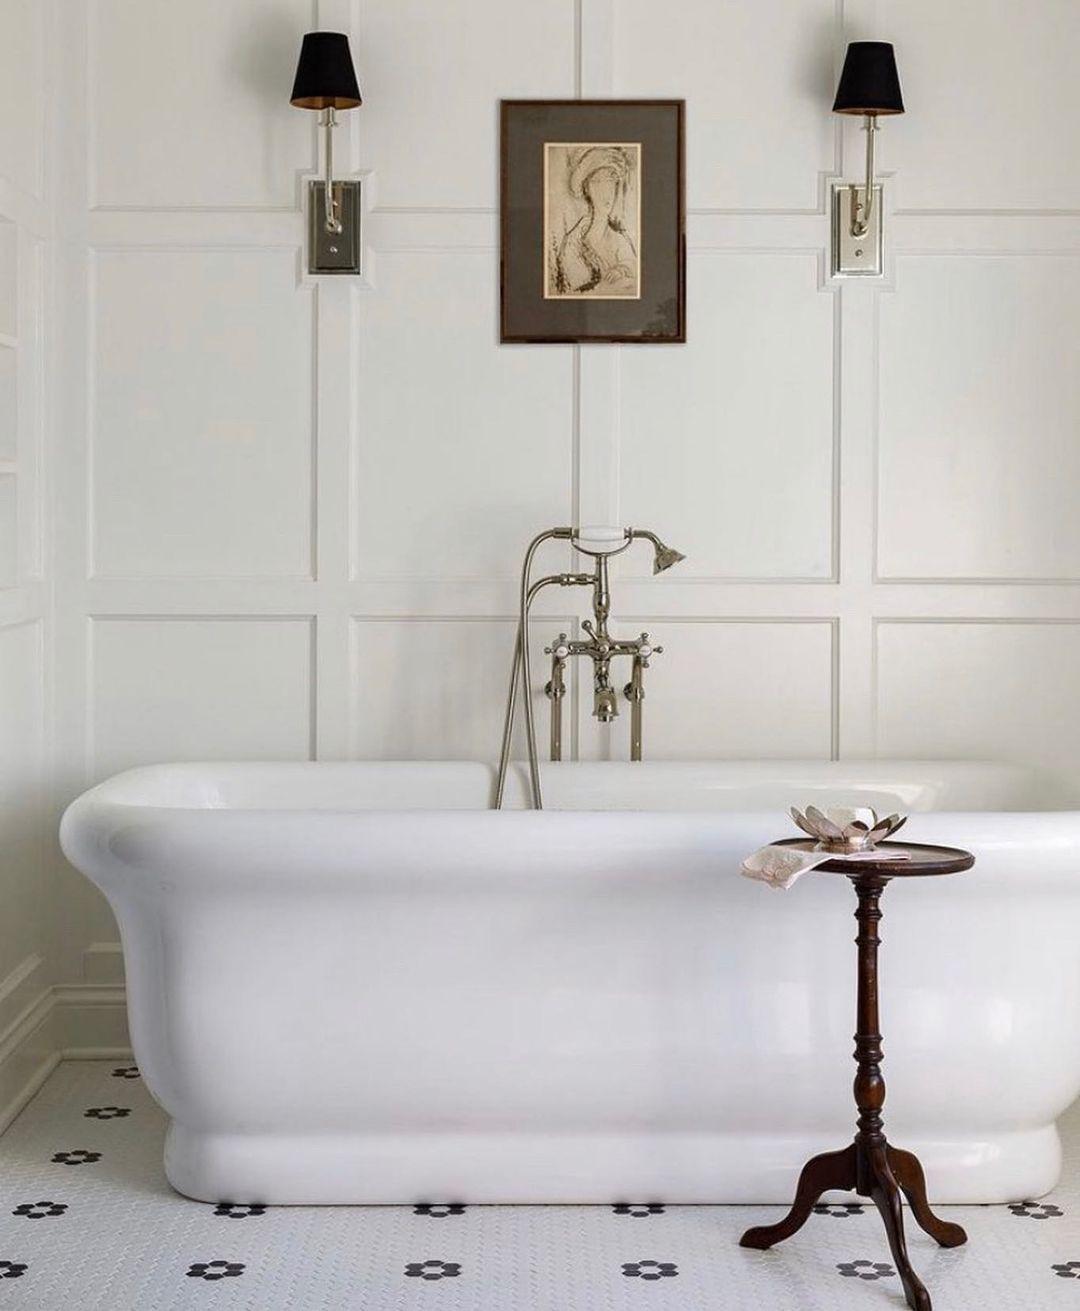 "Photo of Precision Cabinetry & Design's Instagram profile post: ""Loving this space by @m_m_interior_design via @wtrwrks  . . . #homedecor #decor #homedesign #interior #interiors"""